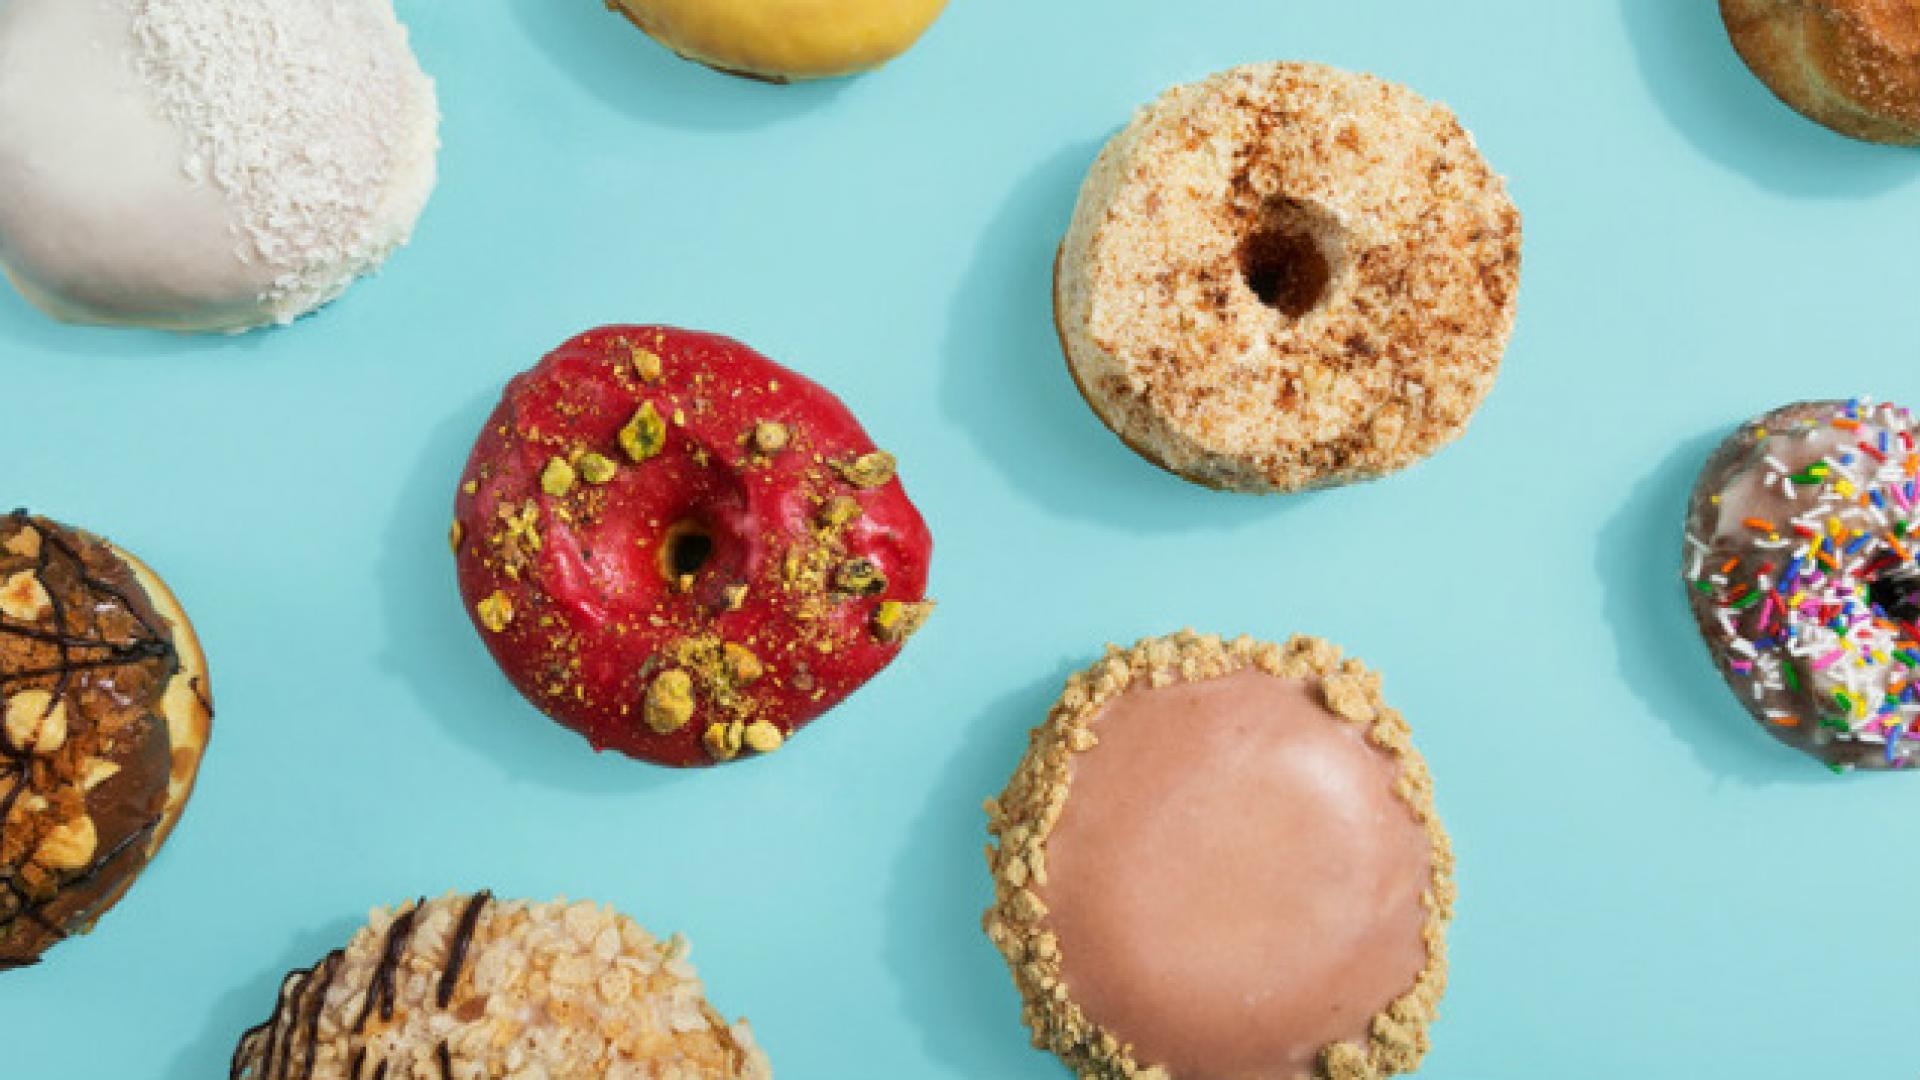 toronto donuts donuts near me glory hole donuts